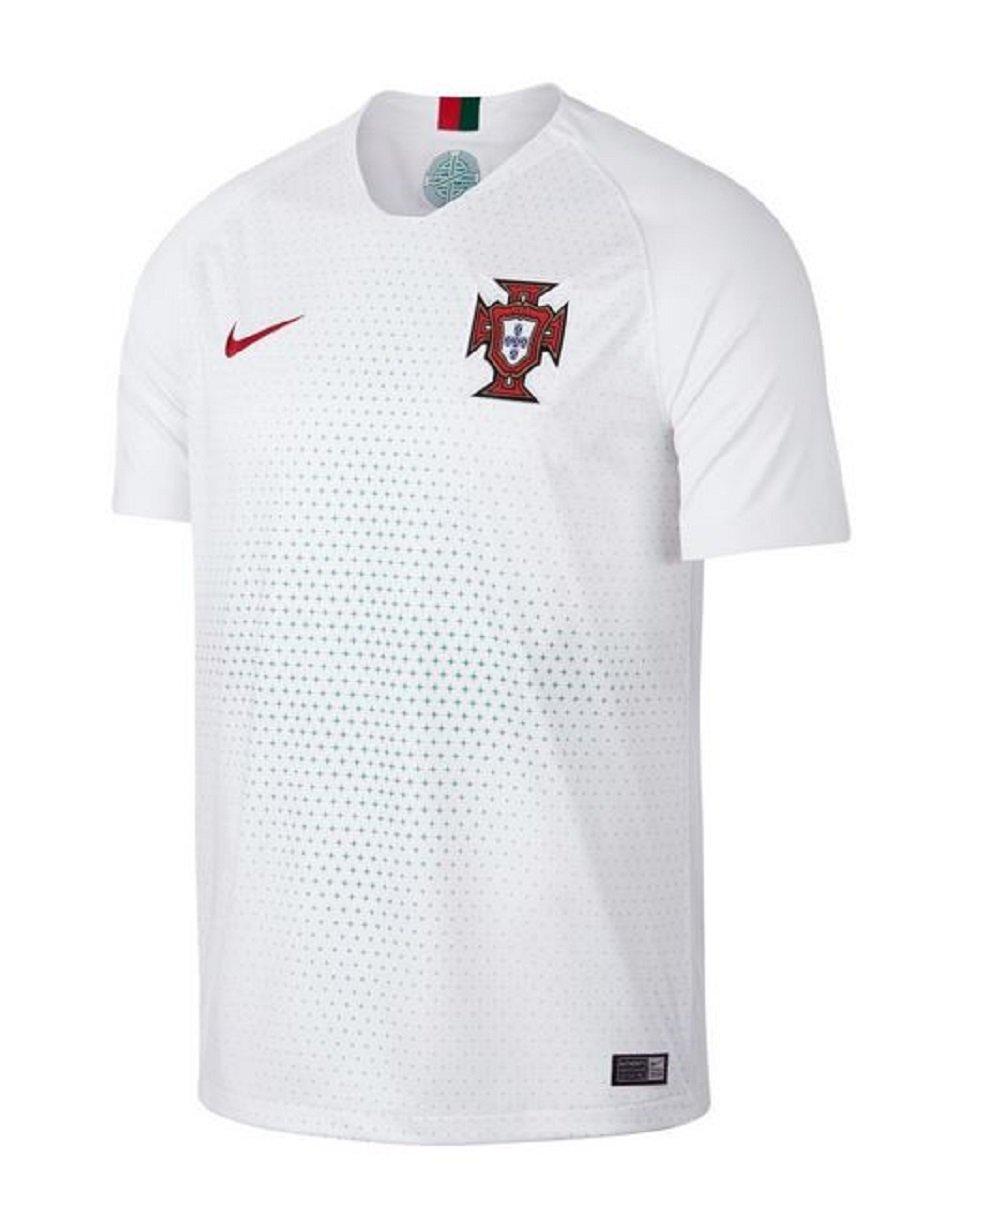 Blanc M Nike Portugal Maillot Away Coupe du Monde 2018 Garçon